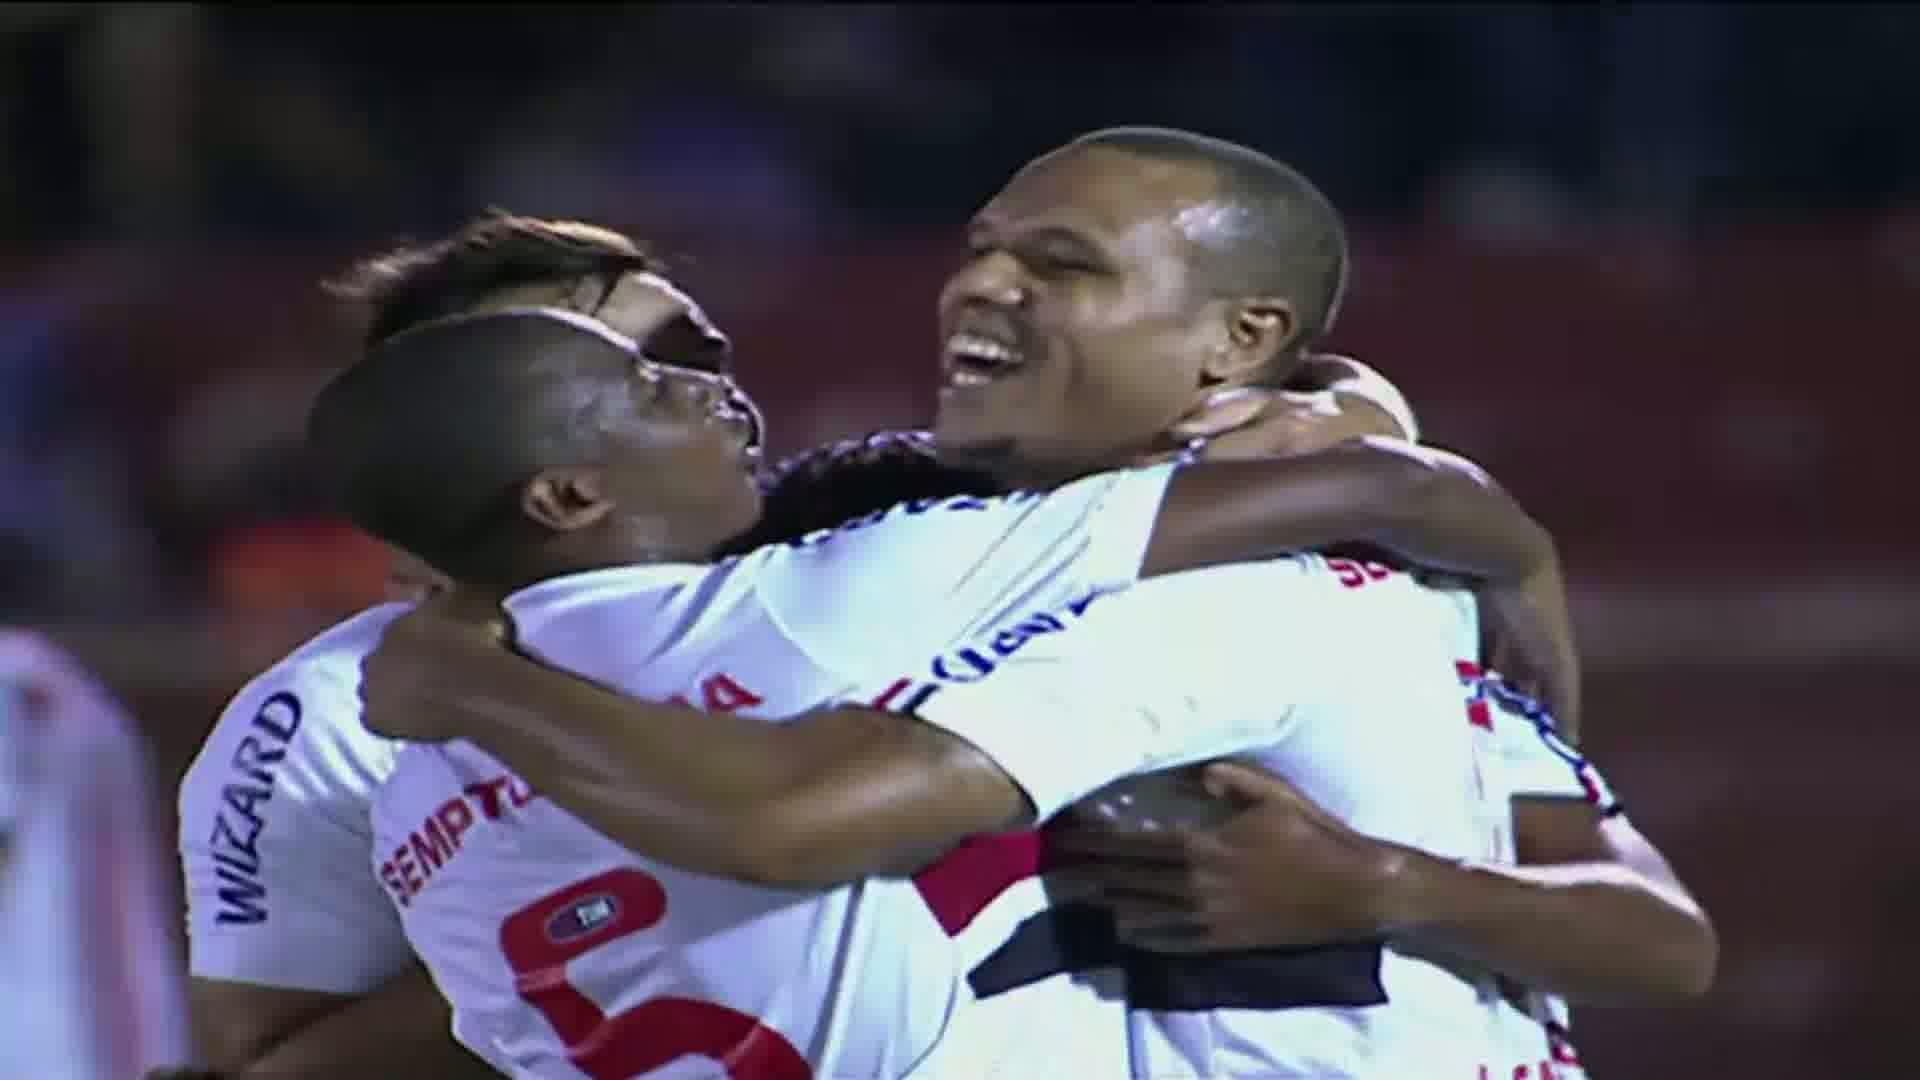 Highlights: Paulista 0-2 Sao Paulo - ESPN Video